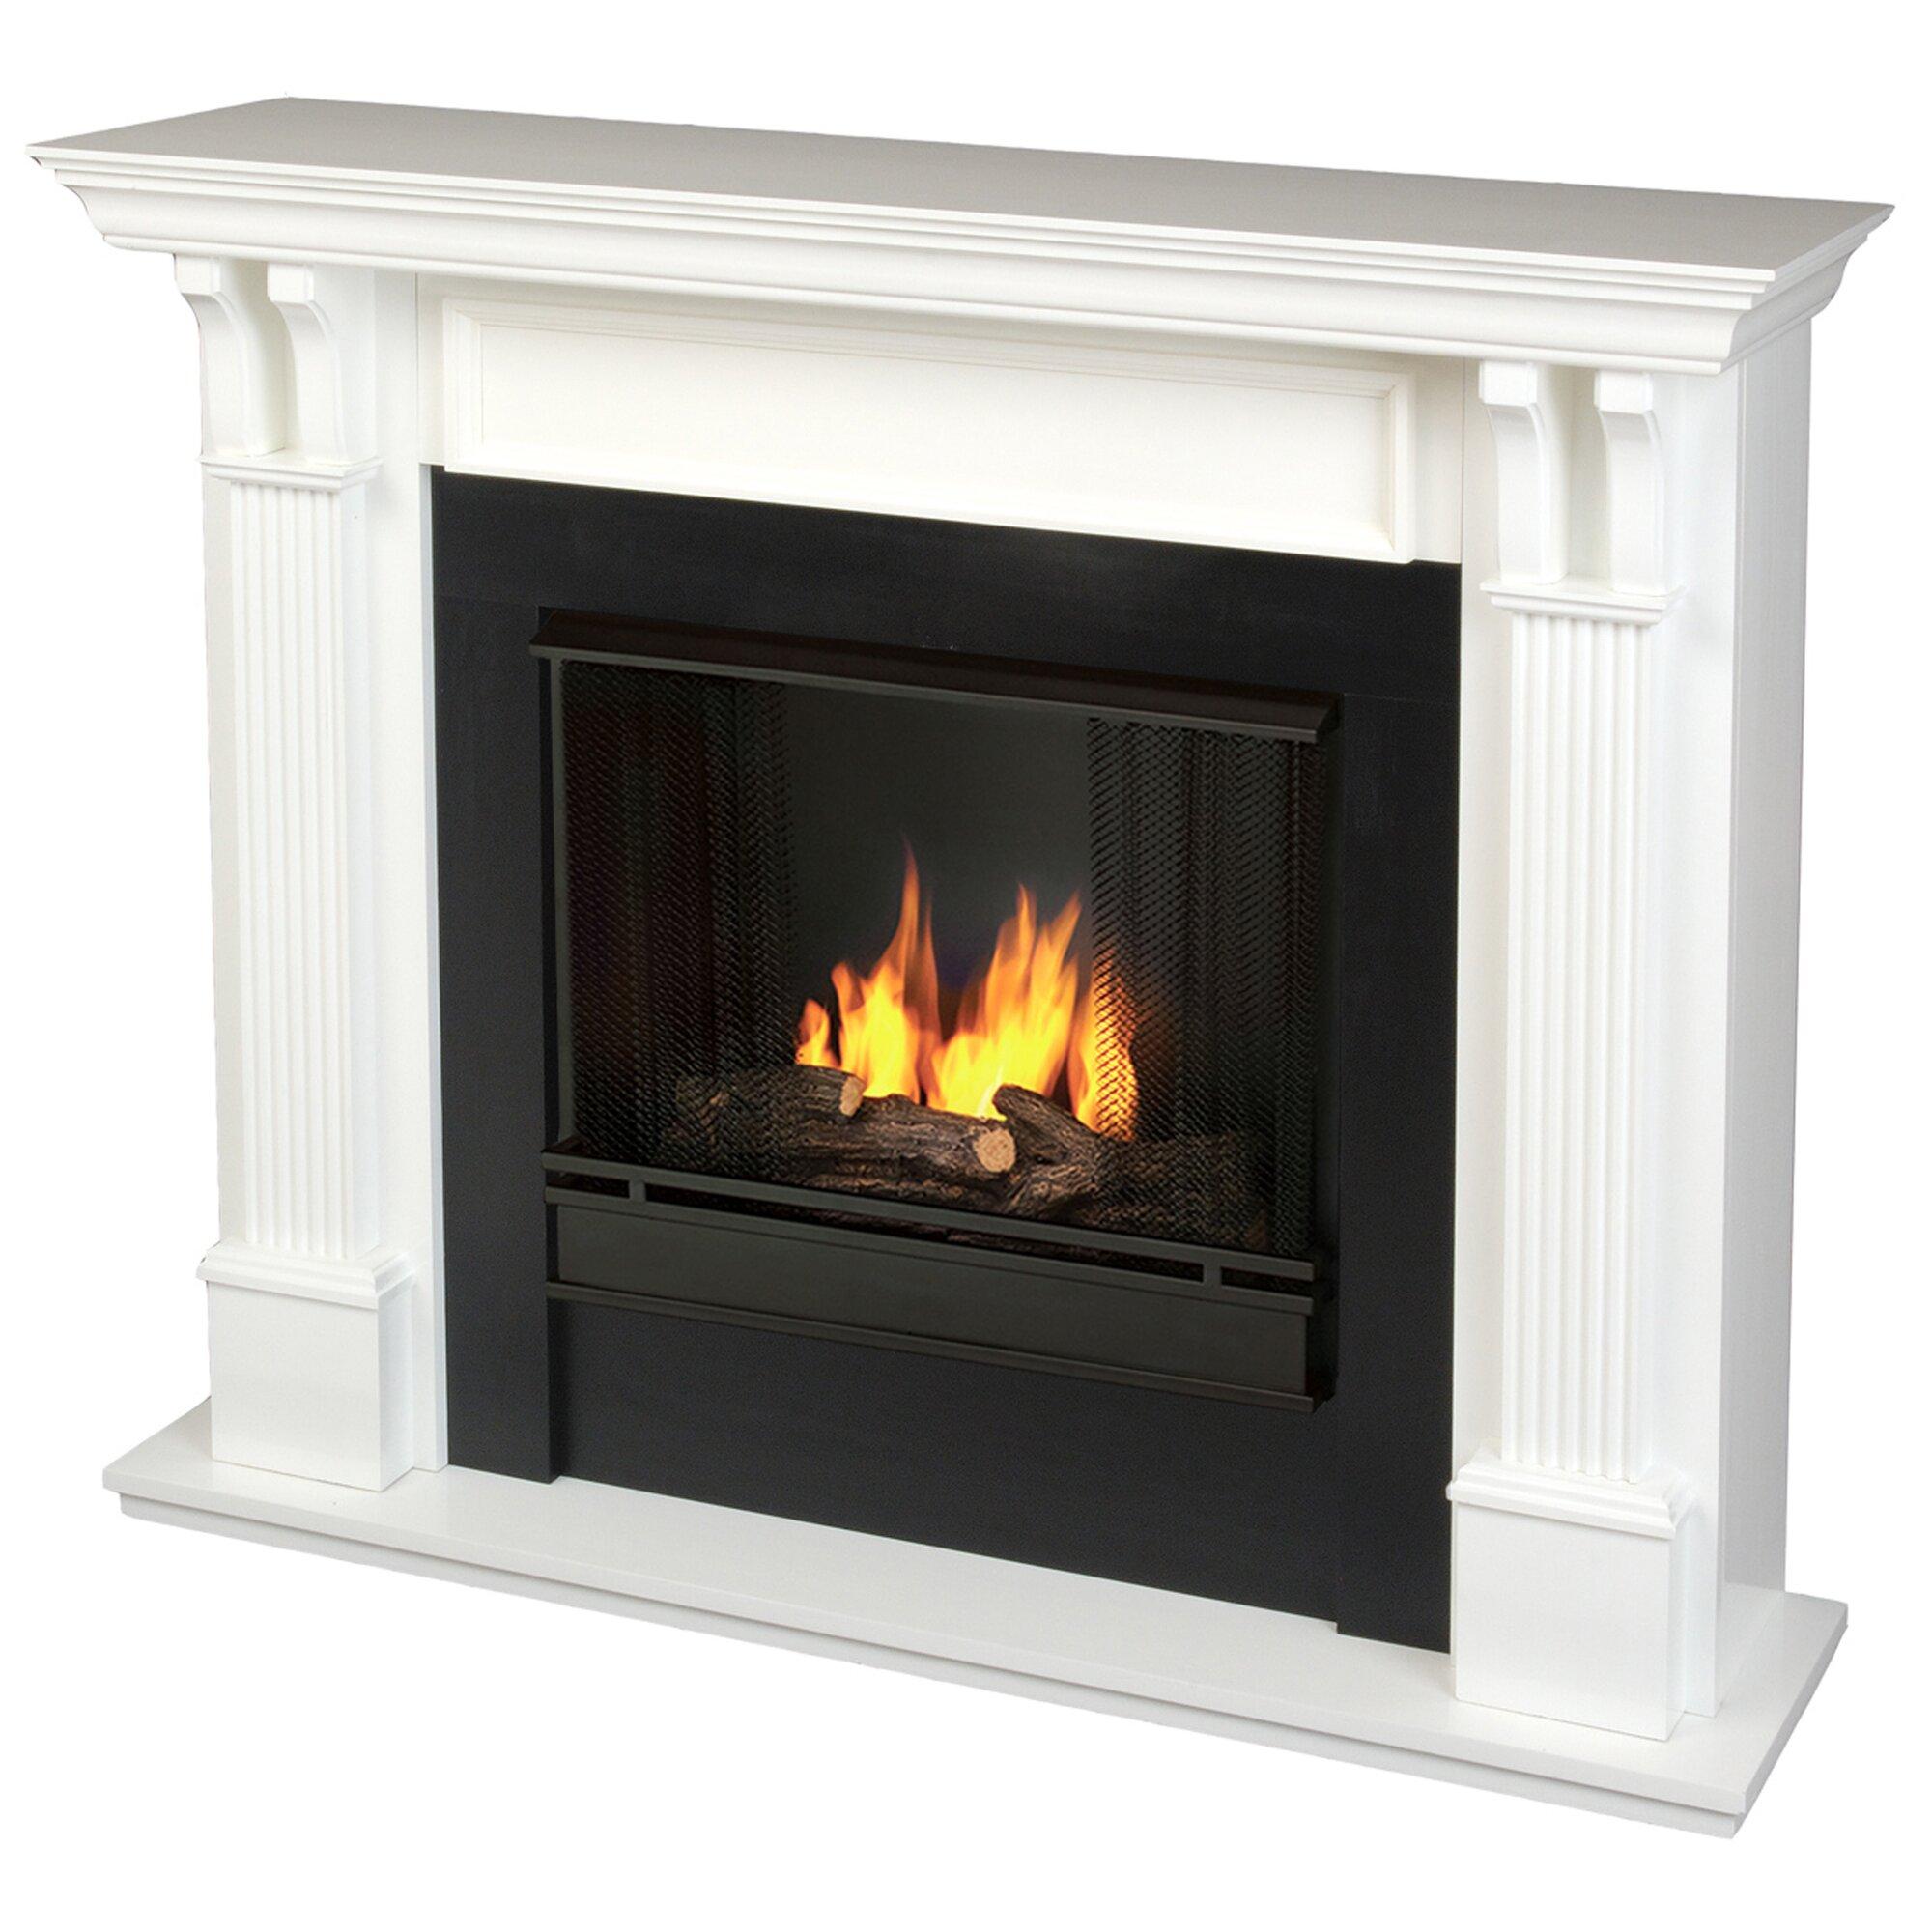 Real Flame Ashley Gel Fuel Fireplace & Reviews | Wayfair